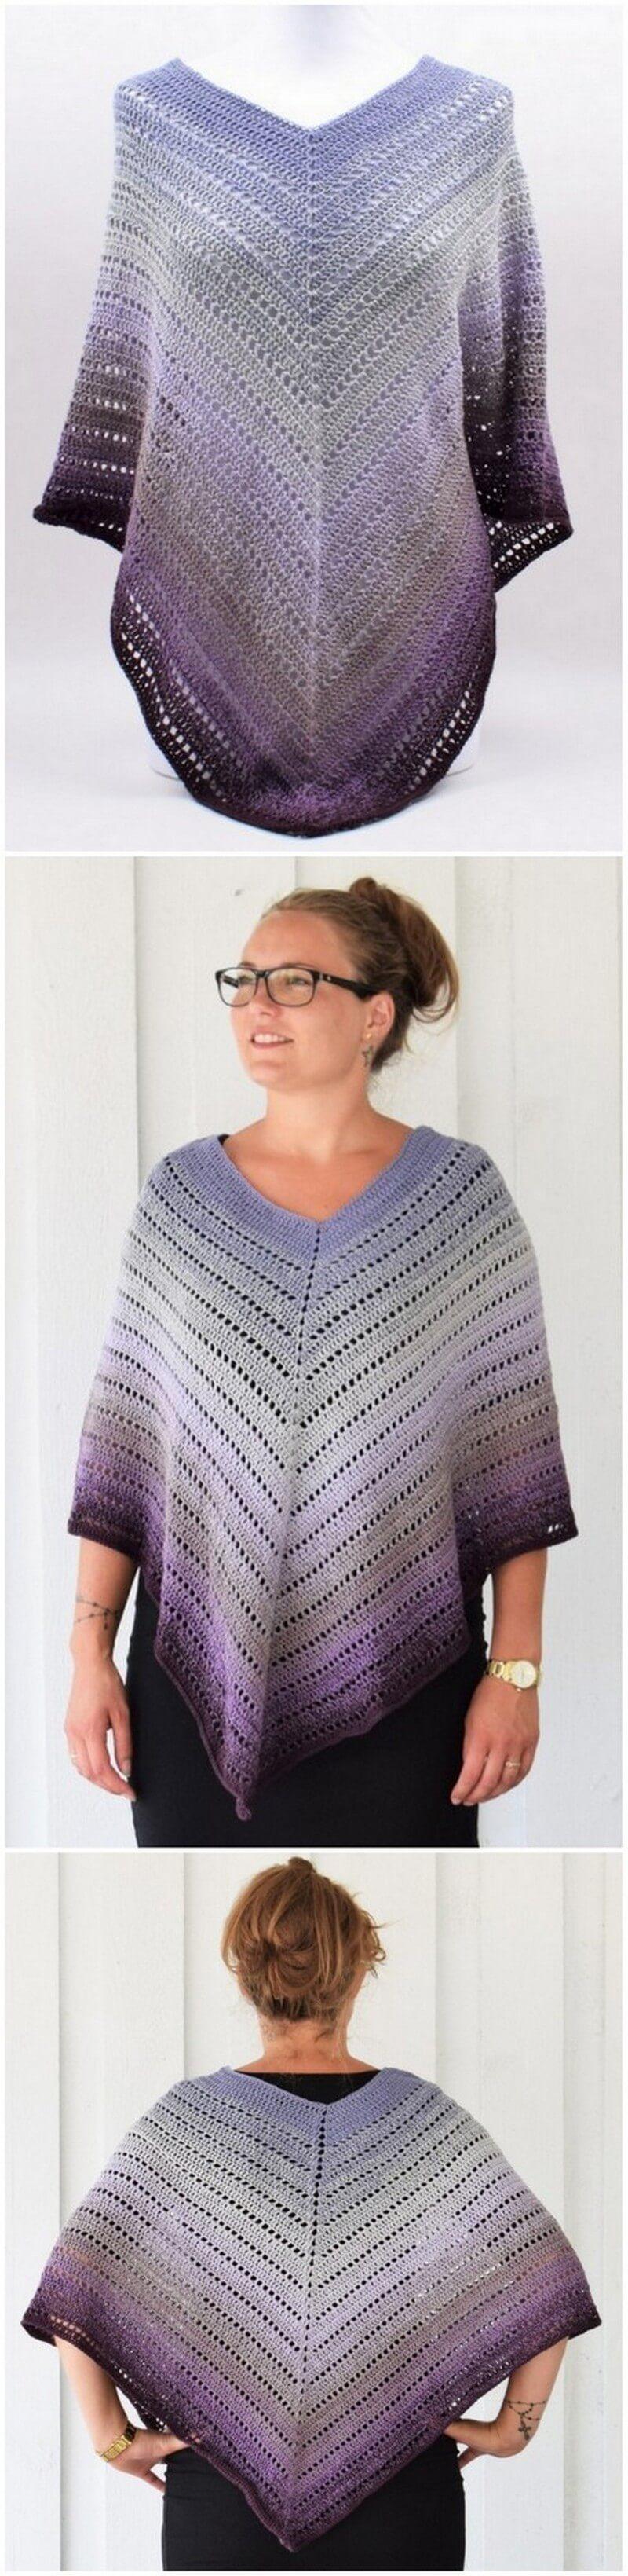 Crochet Poncho Pattern (43)